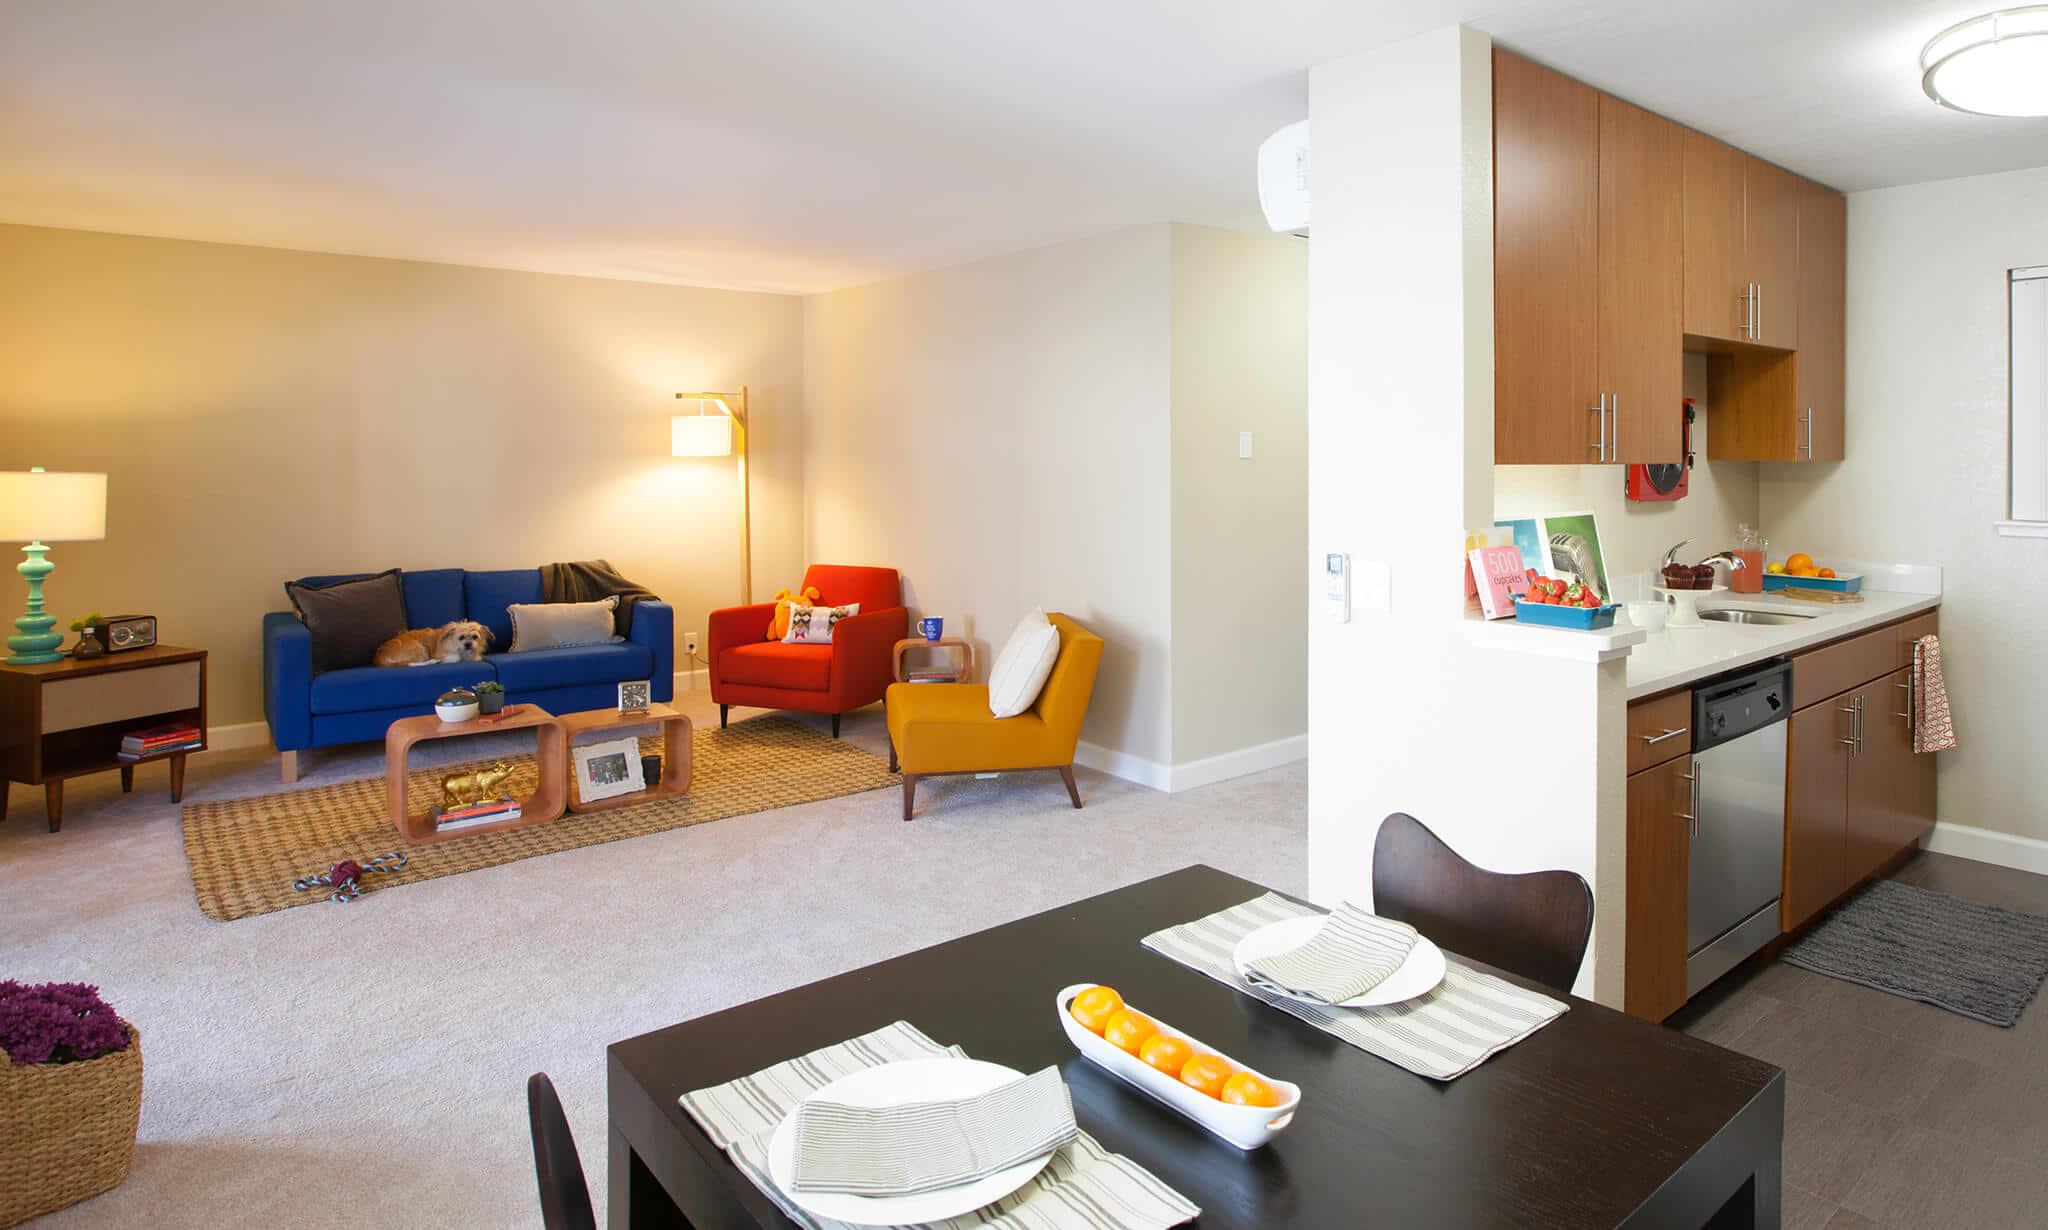 Alderwood Apartments apartments in Santa Clara CA to rent photo 8